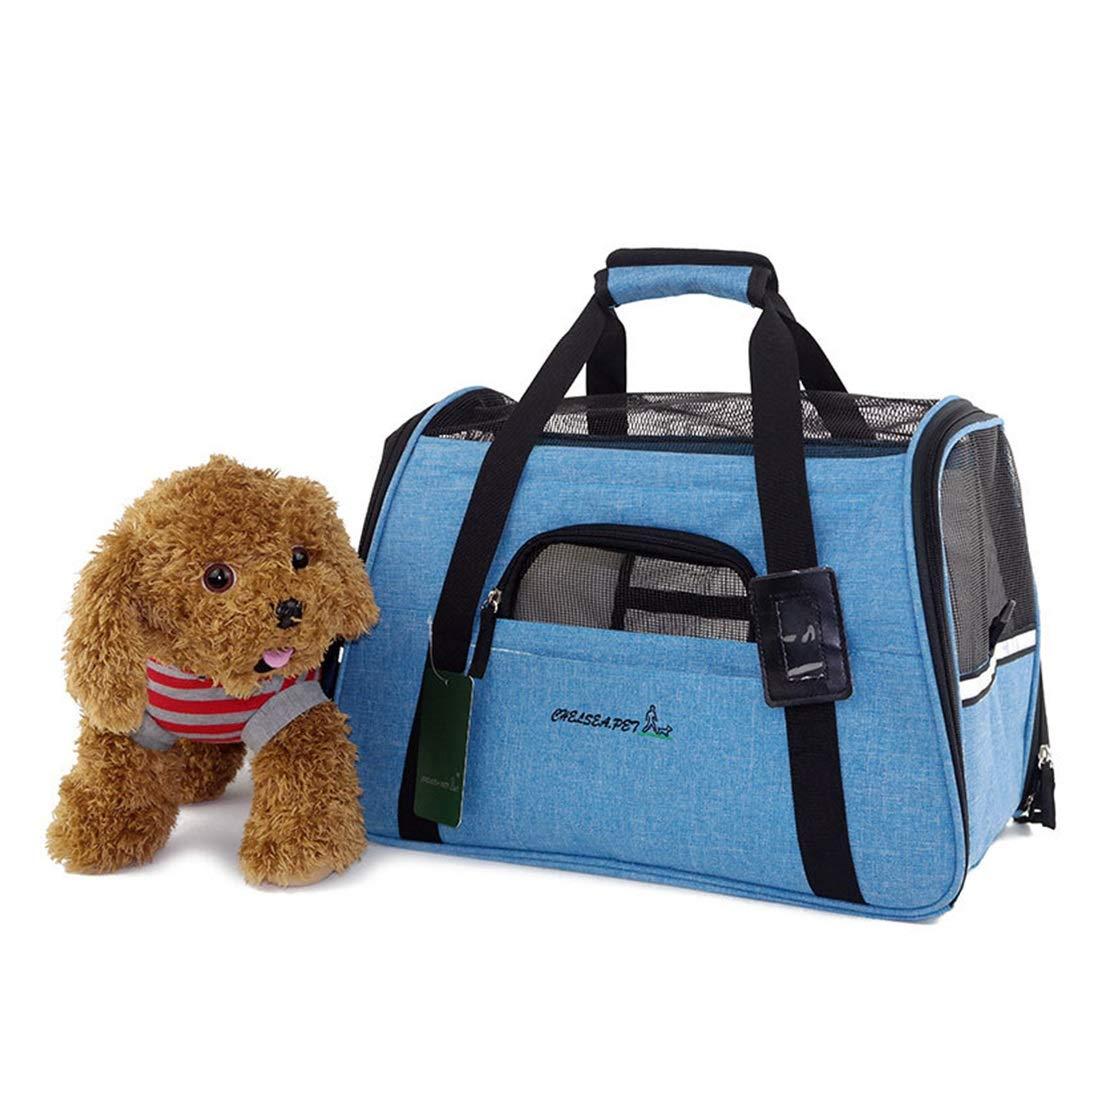 JINHONGH Outing Pet Supplies Traspirante Traspirante Traspirante Cat Litter Kennel Mesh Shoulder Bag Borsa da Viaggio per Animali da Compagnia (Colore   Water blu, Dimensione   45X26X28cm) 3c1941